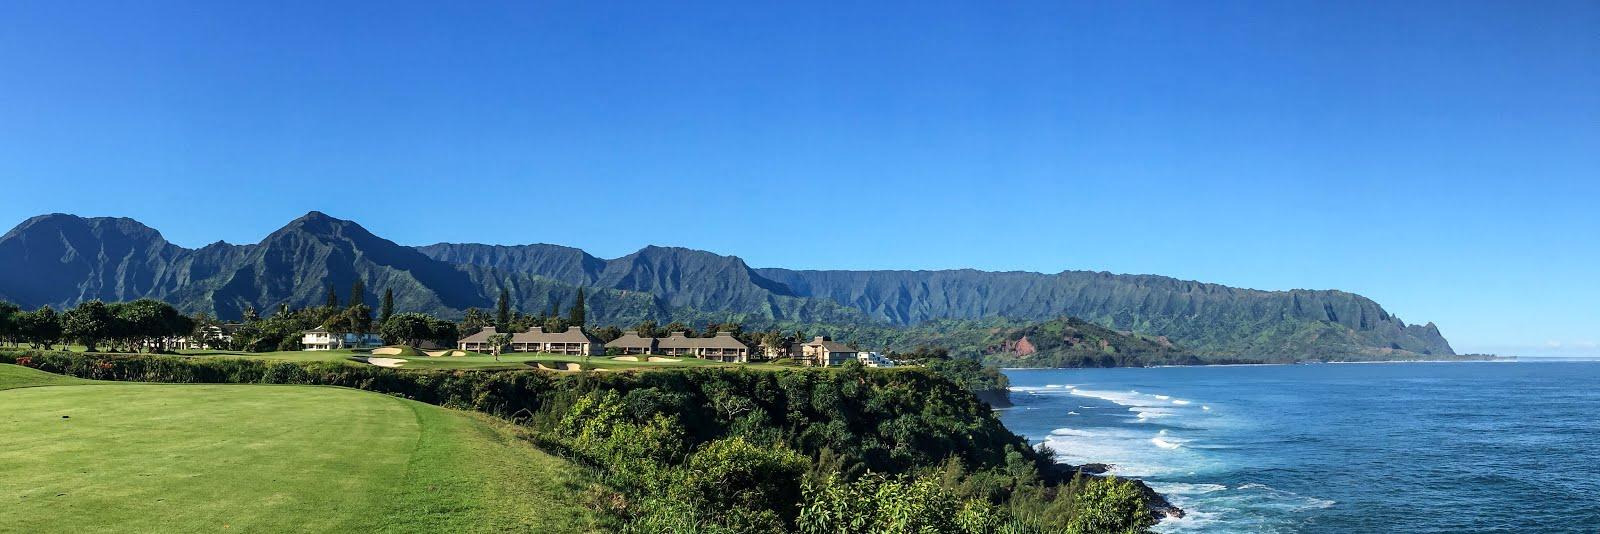 kauai real estate for sale princeville homes for sale